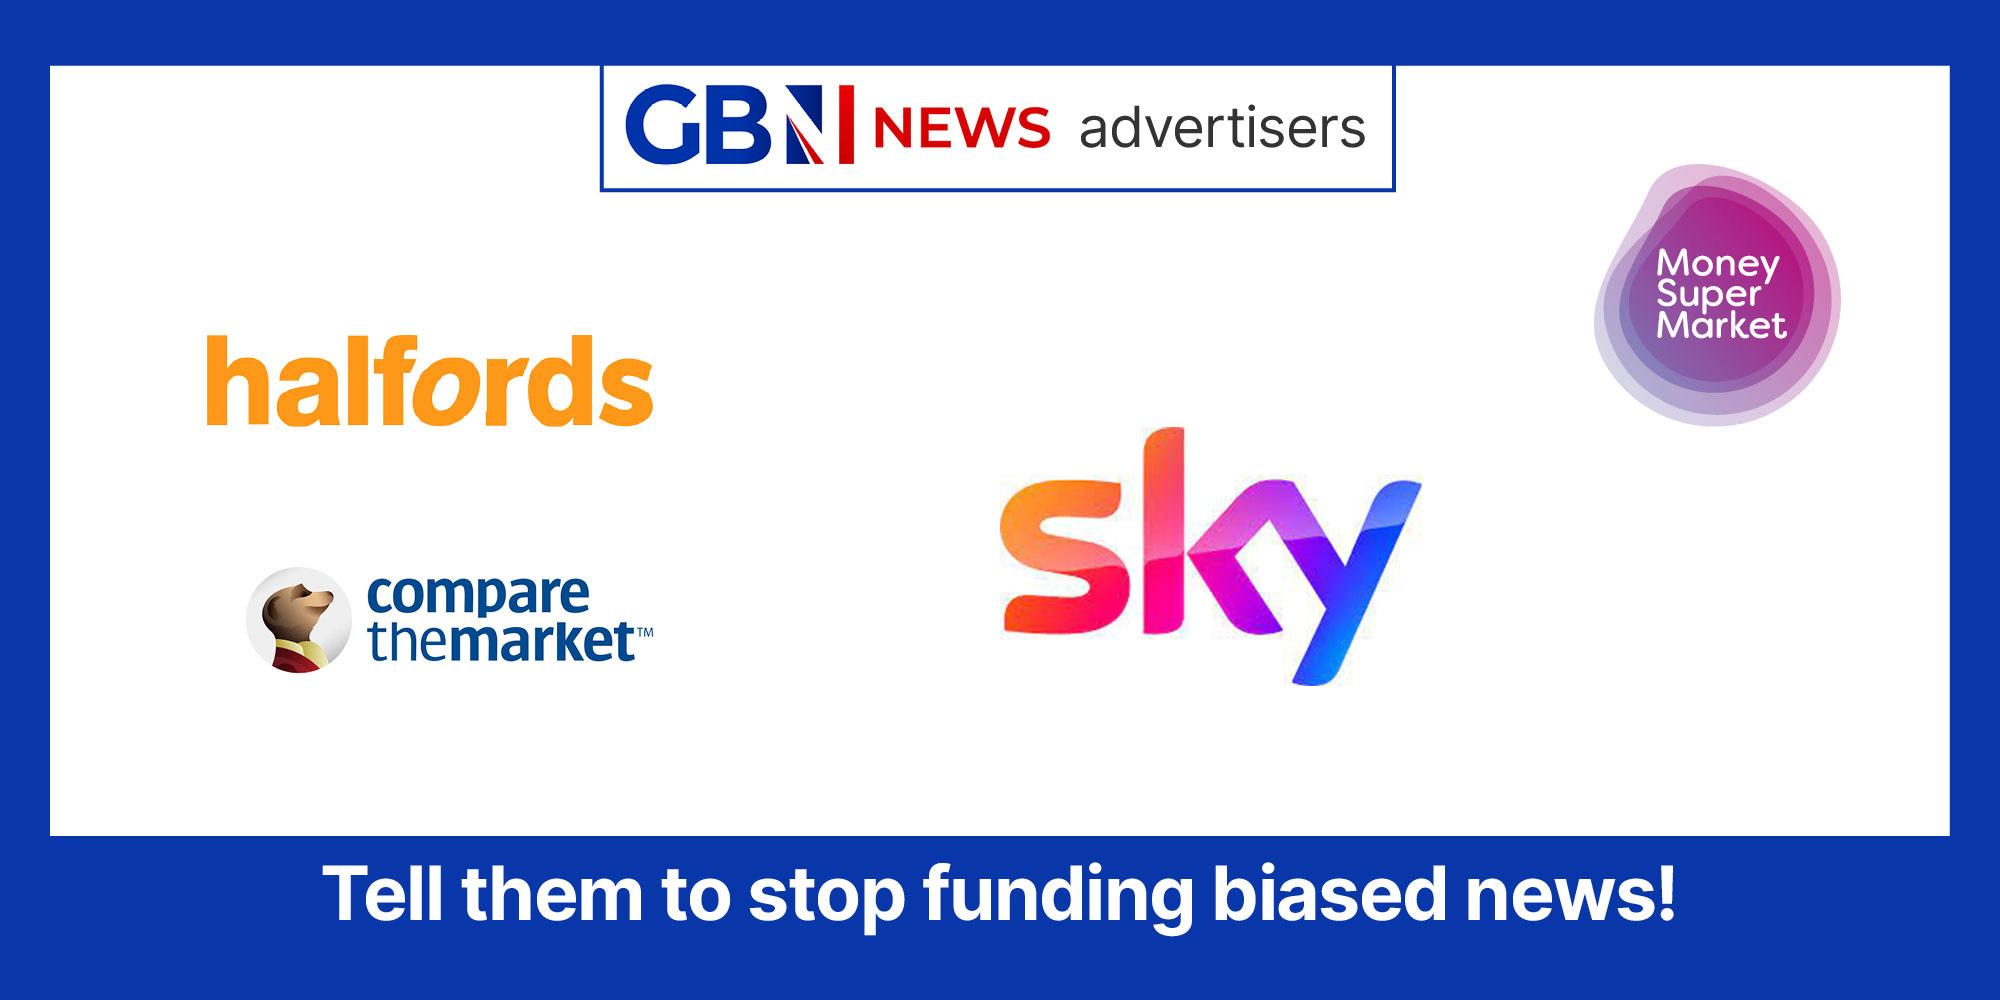 GB News advertisers